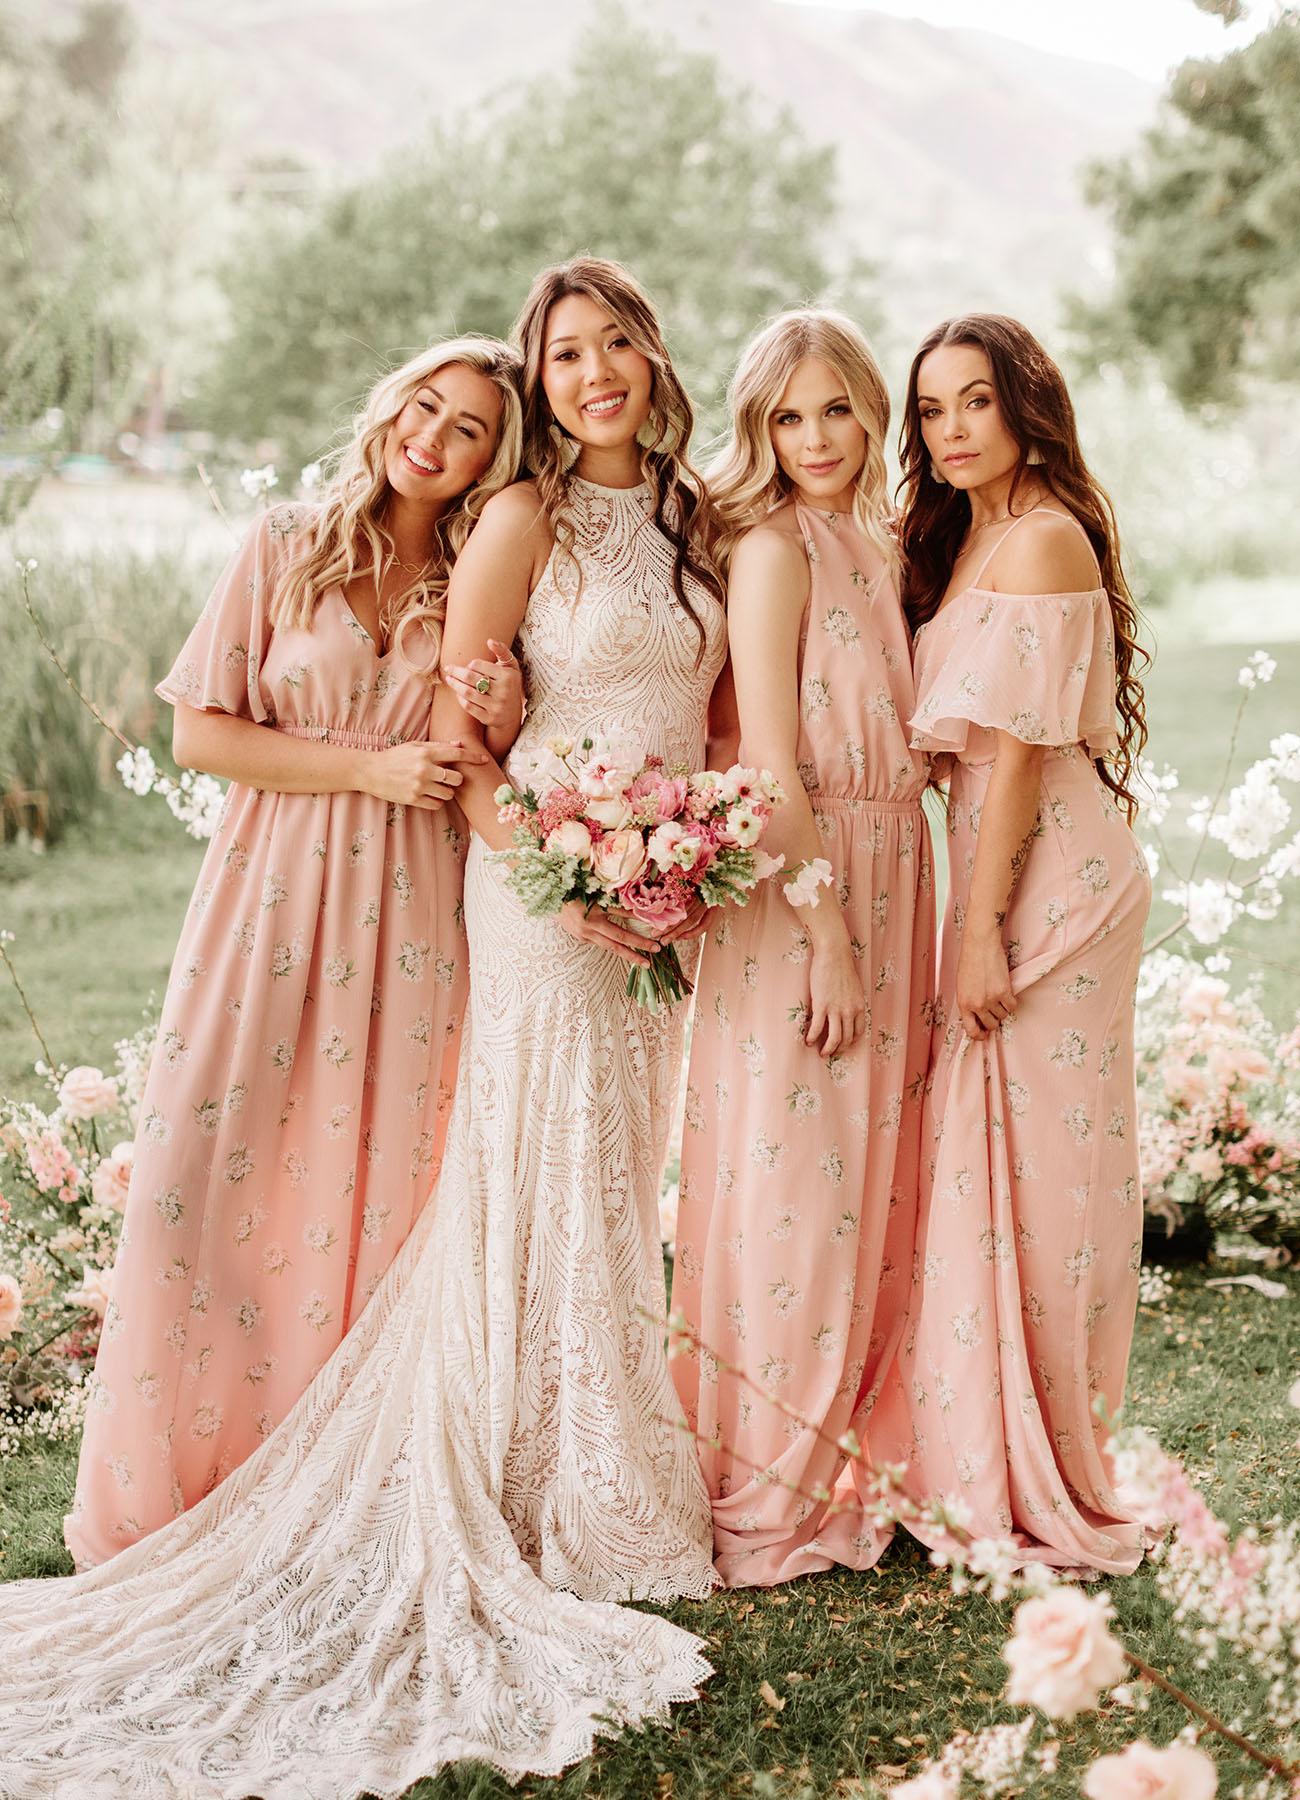 GWSxMumu Blush Bridesmaids